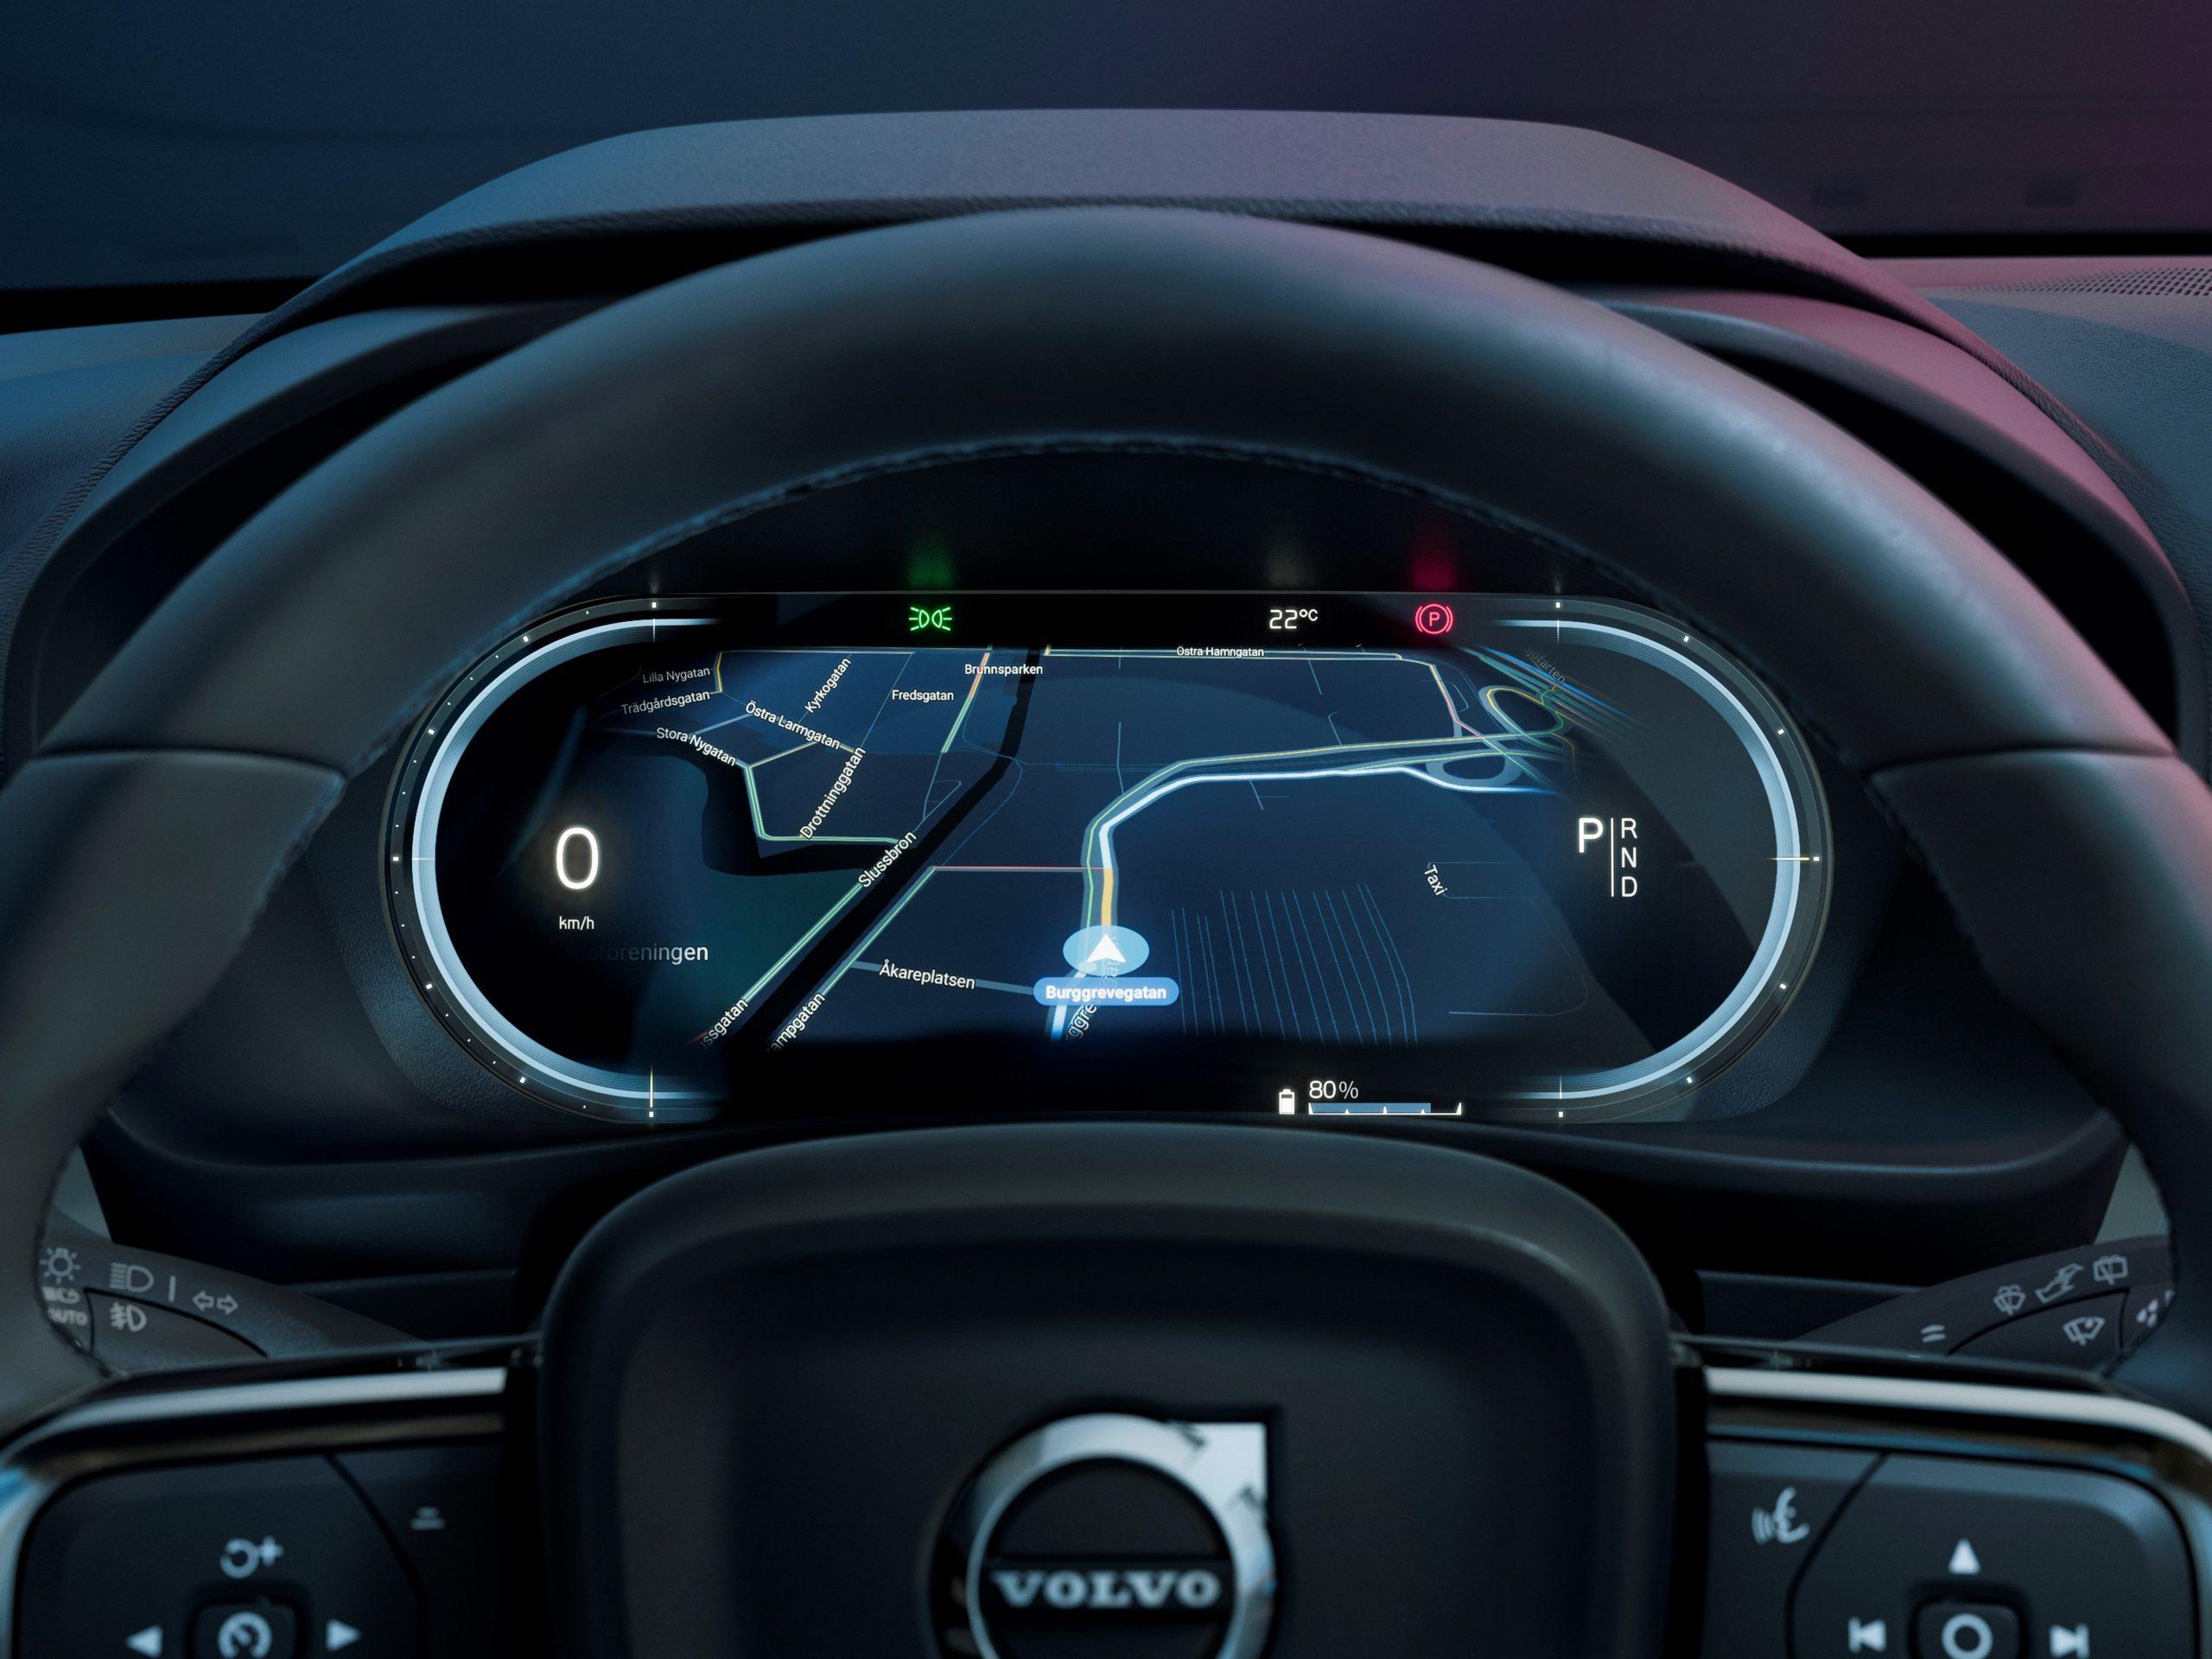 Volvo C40 Recharge digital instrument dash cluster